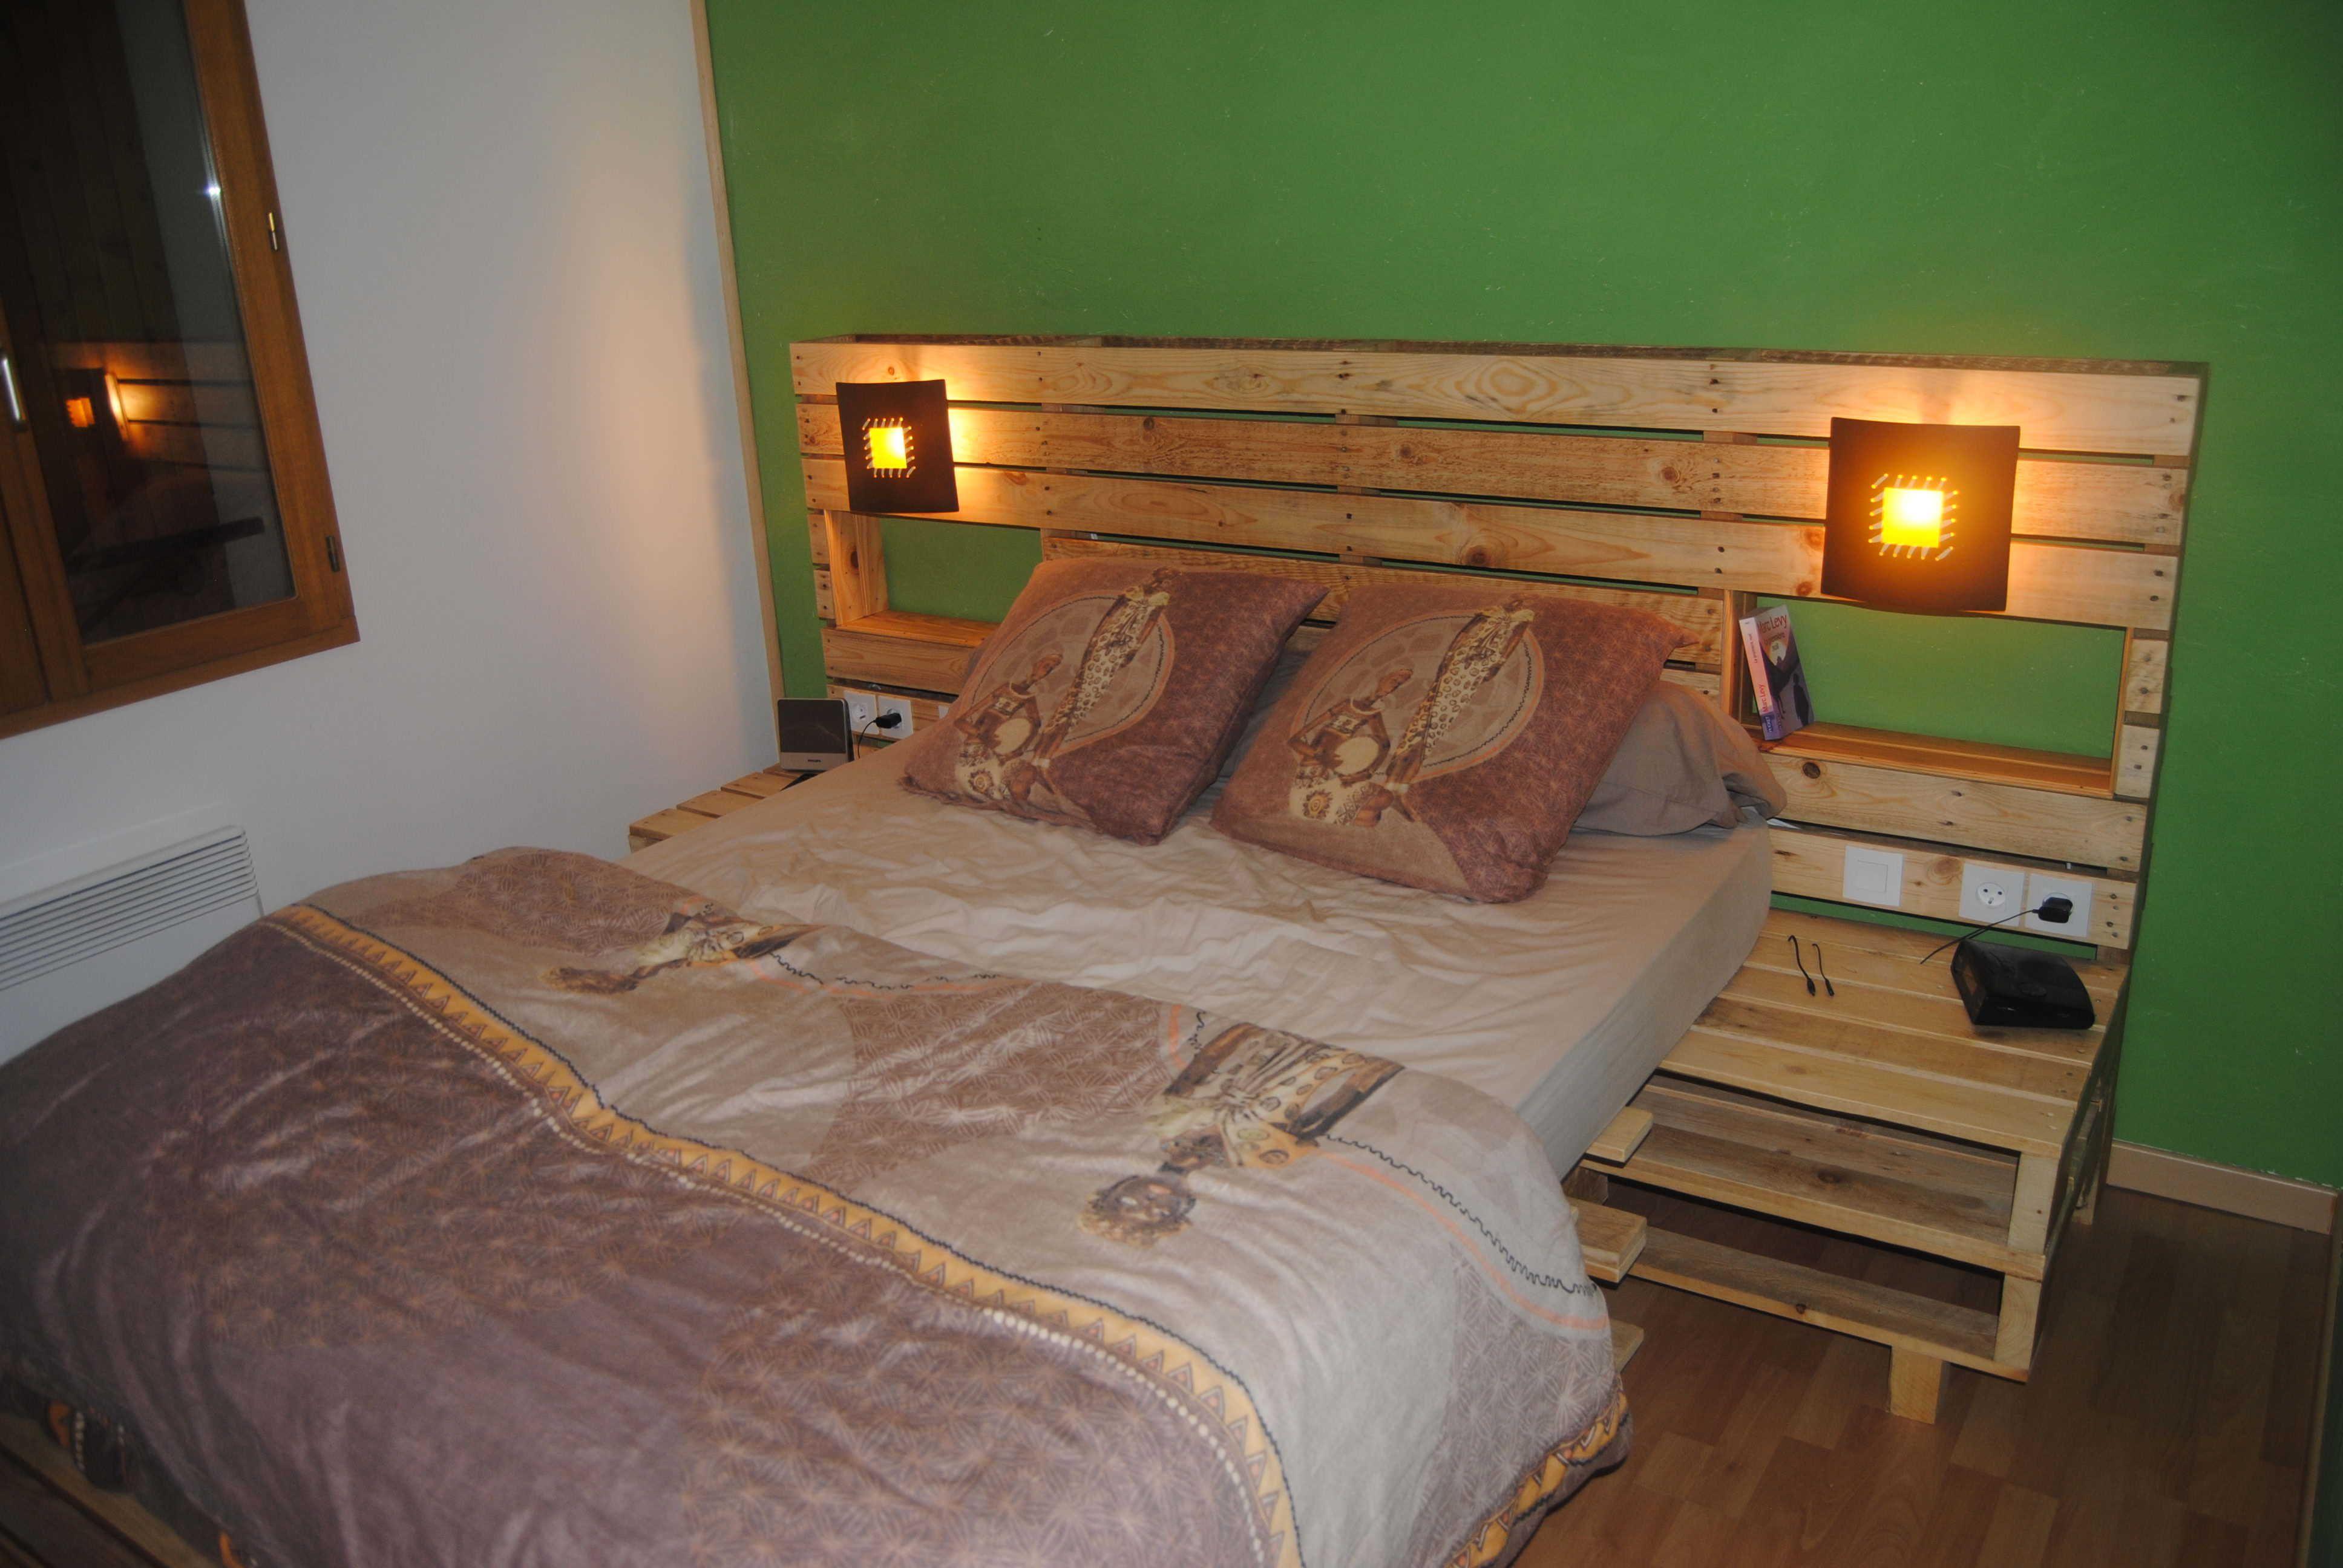 kopfteil f r bett aus europaletten selber bauen diy anleitung diy m bel selber machen. Black Bedroom Furniture Sets. Home Design Ideas